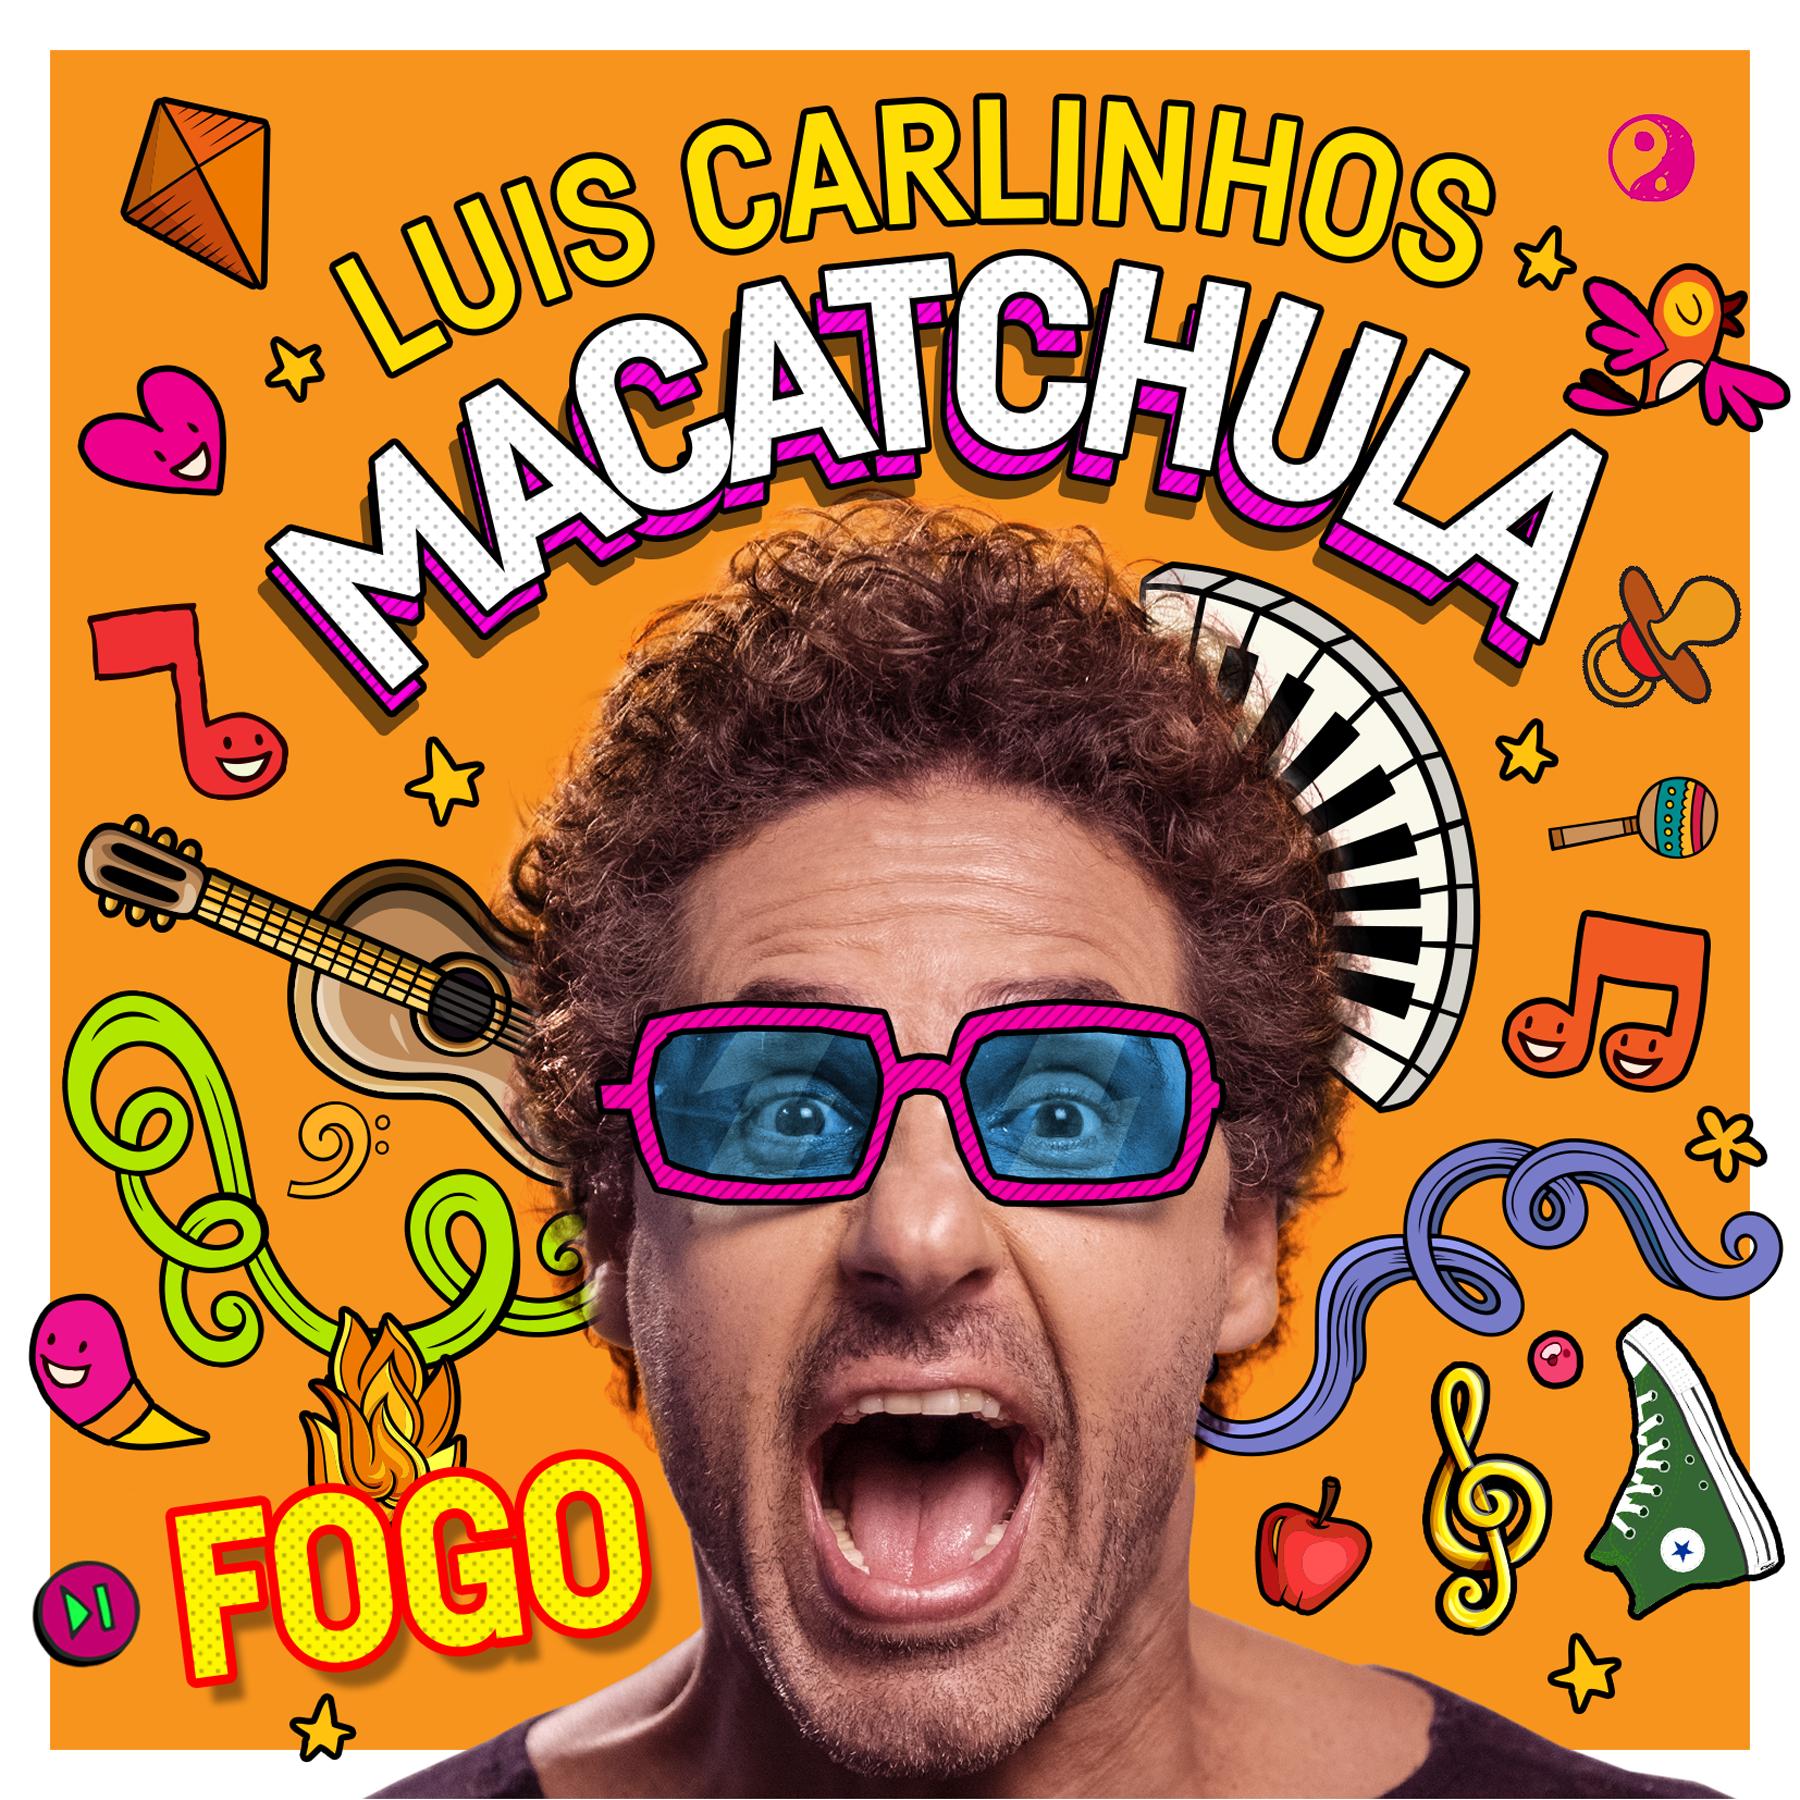 Macathcula_fogo